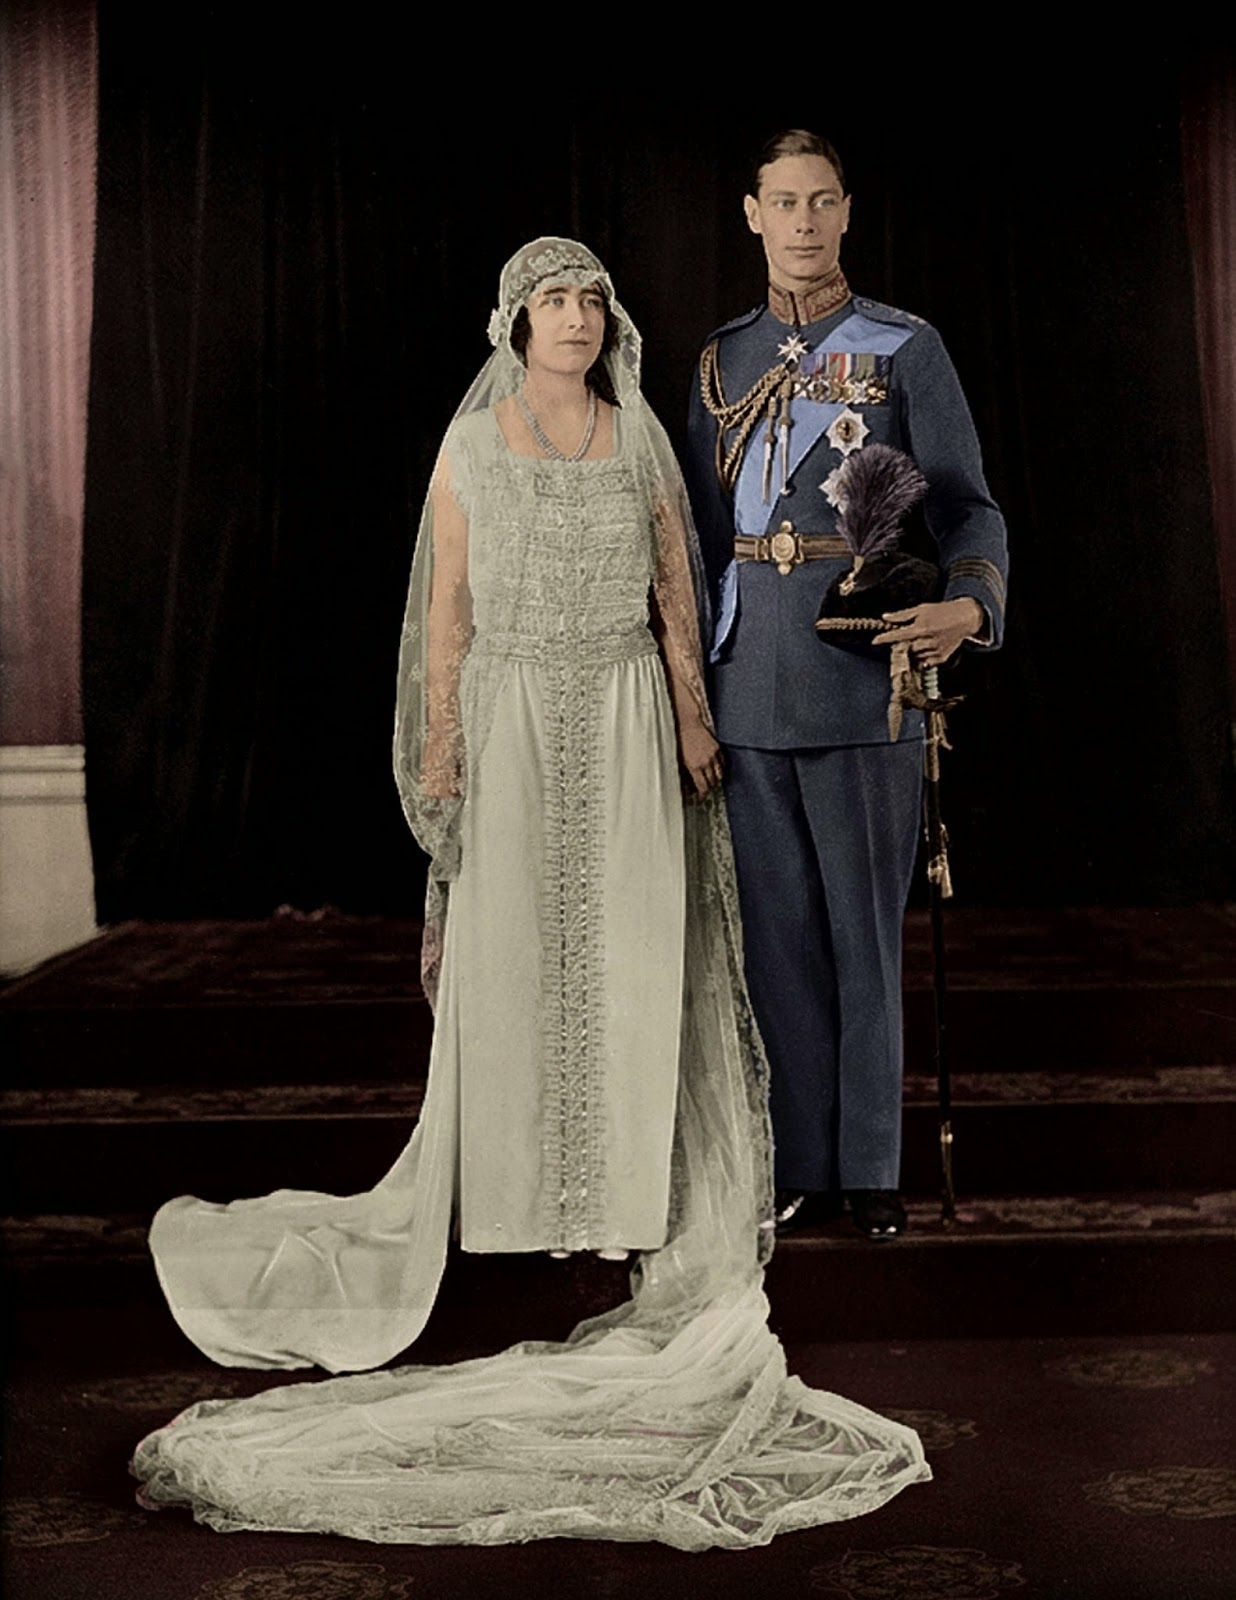 Wedding Of King George Vi And Queen Elizabeth